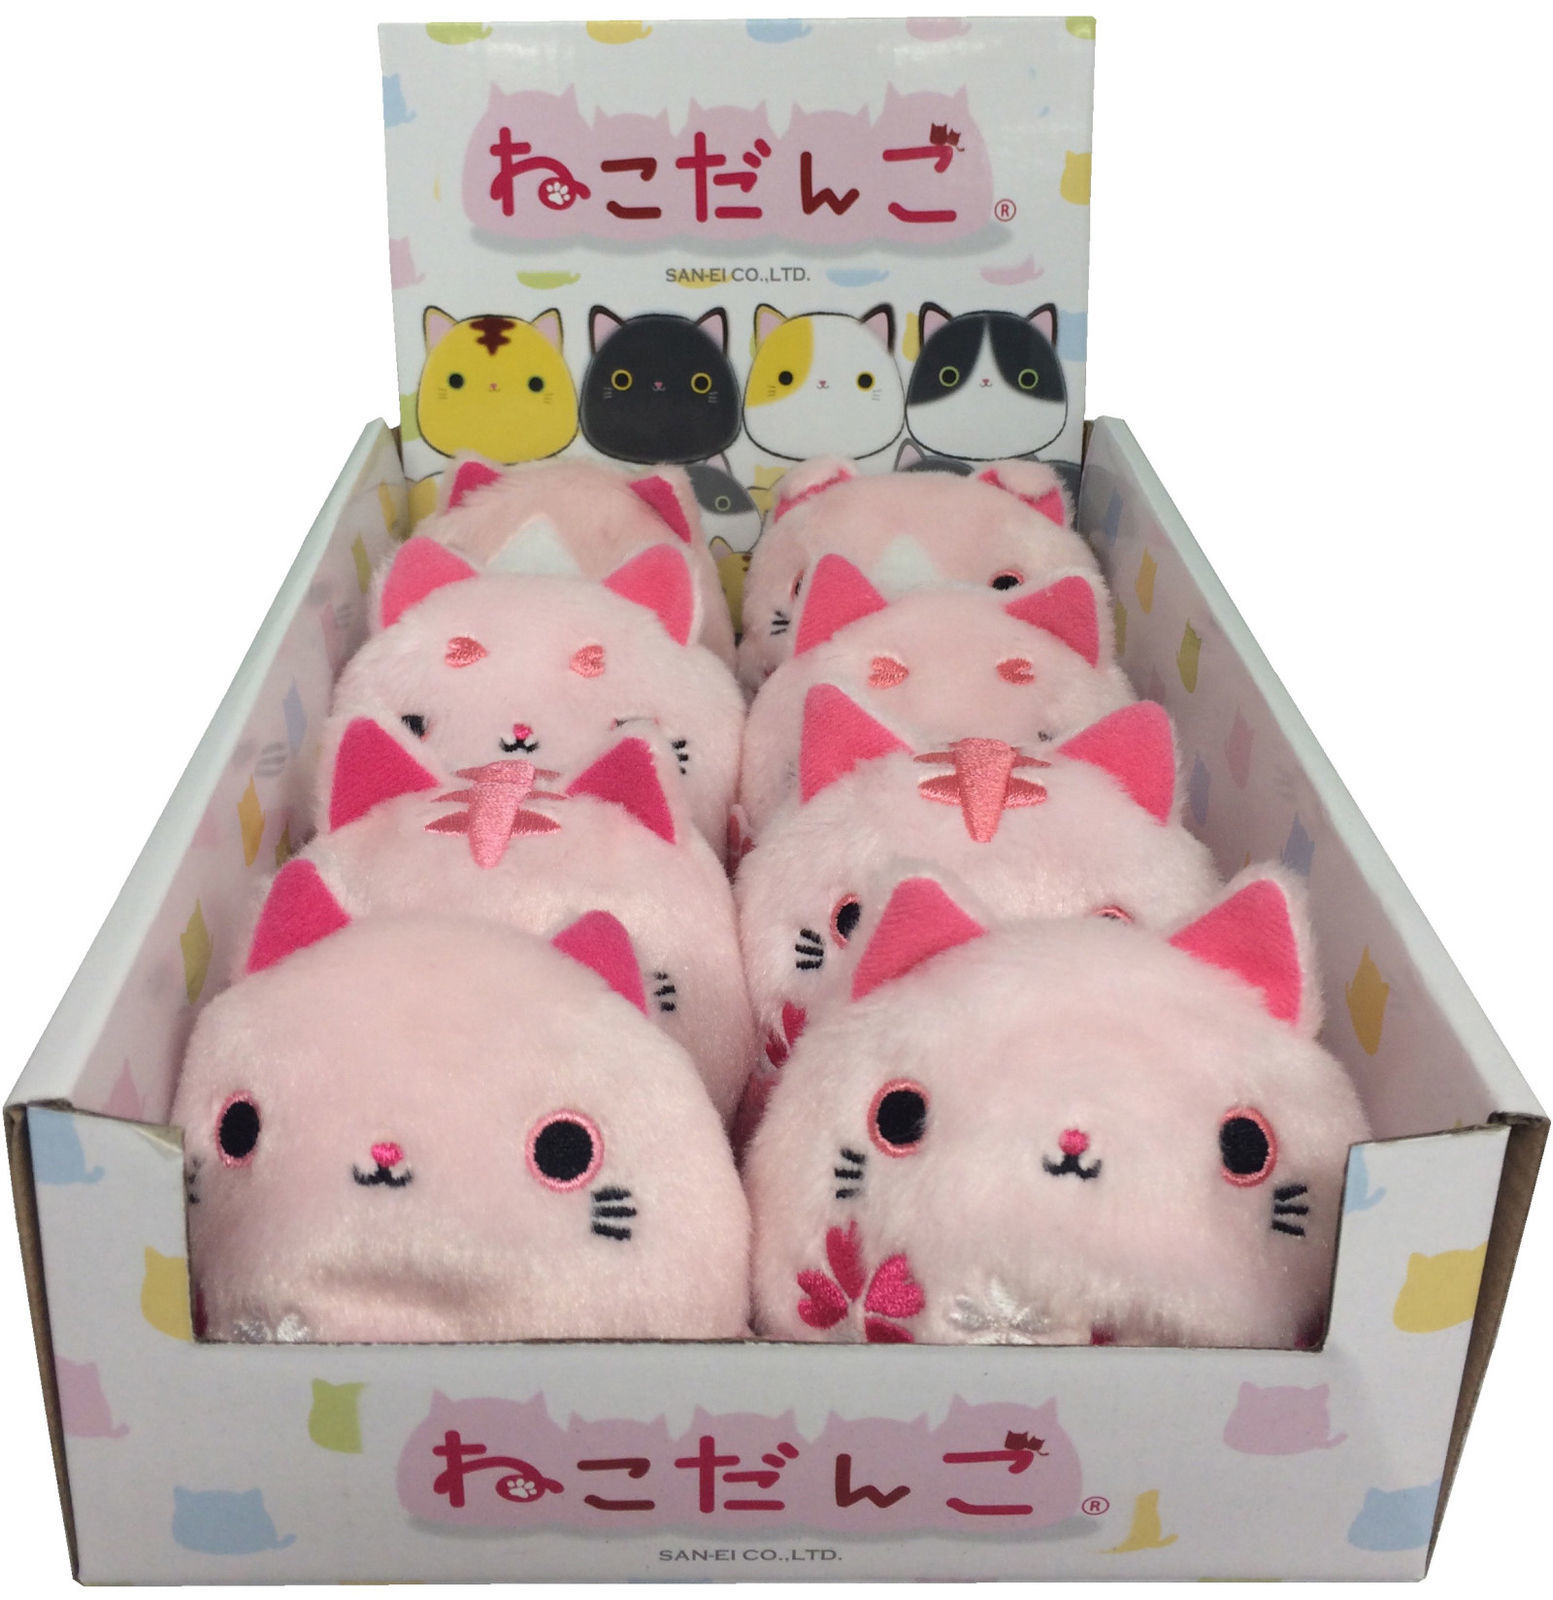 Neko Dango Sakura Plush Series image